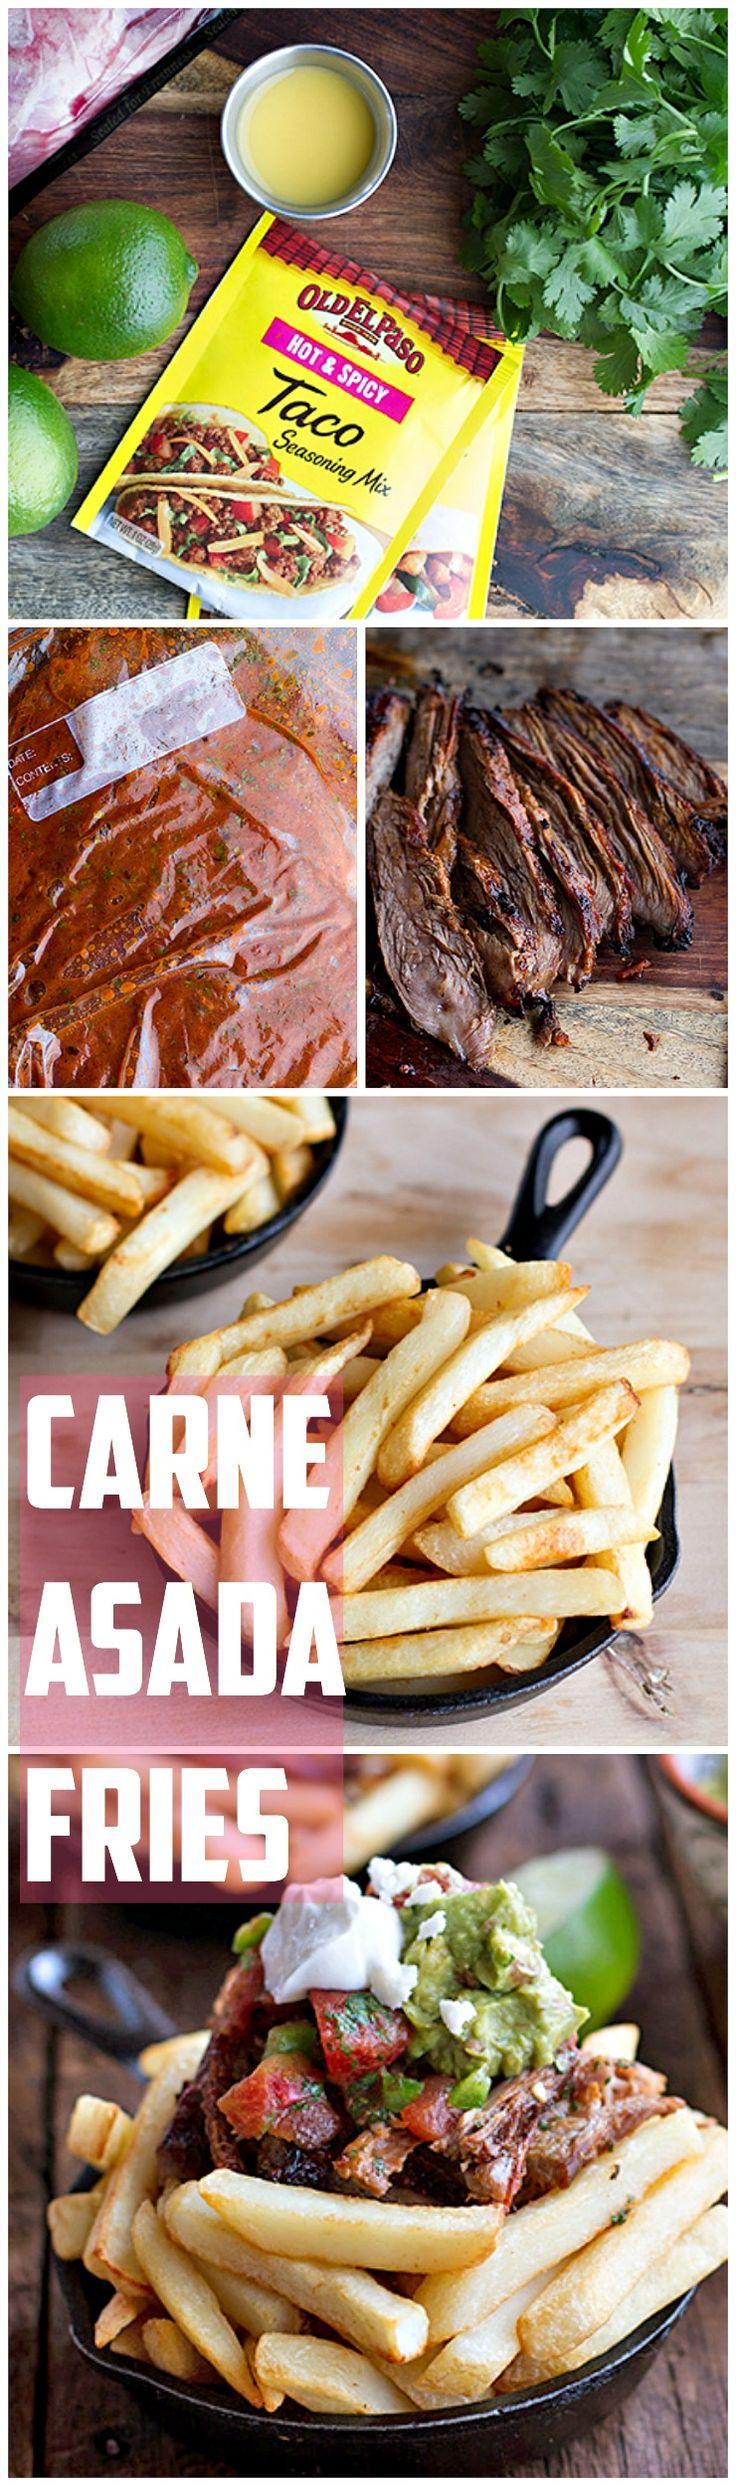 Carne Asada Fries